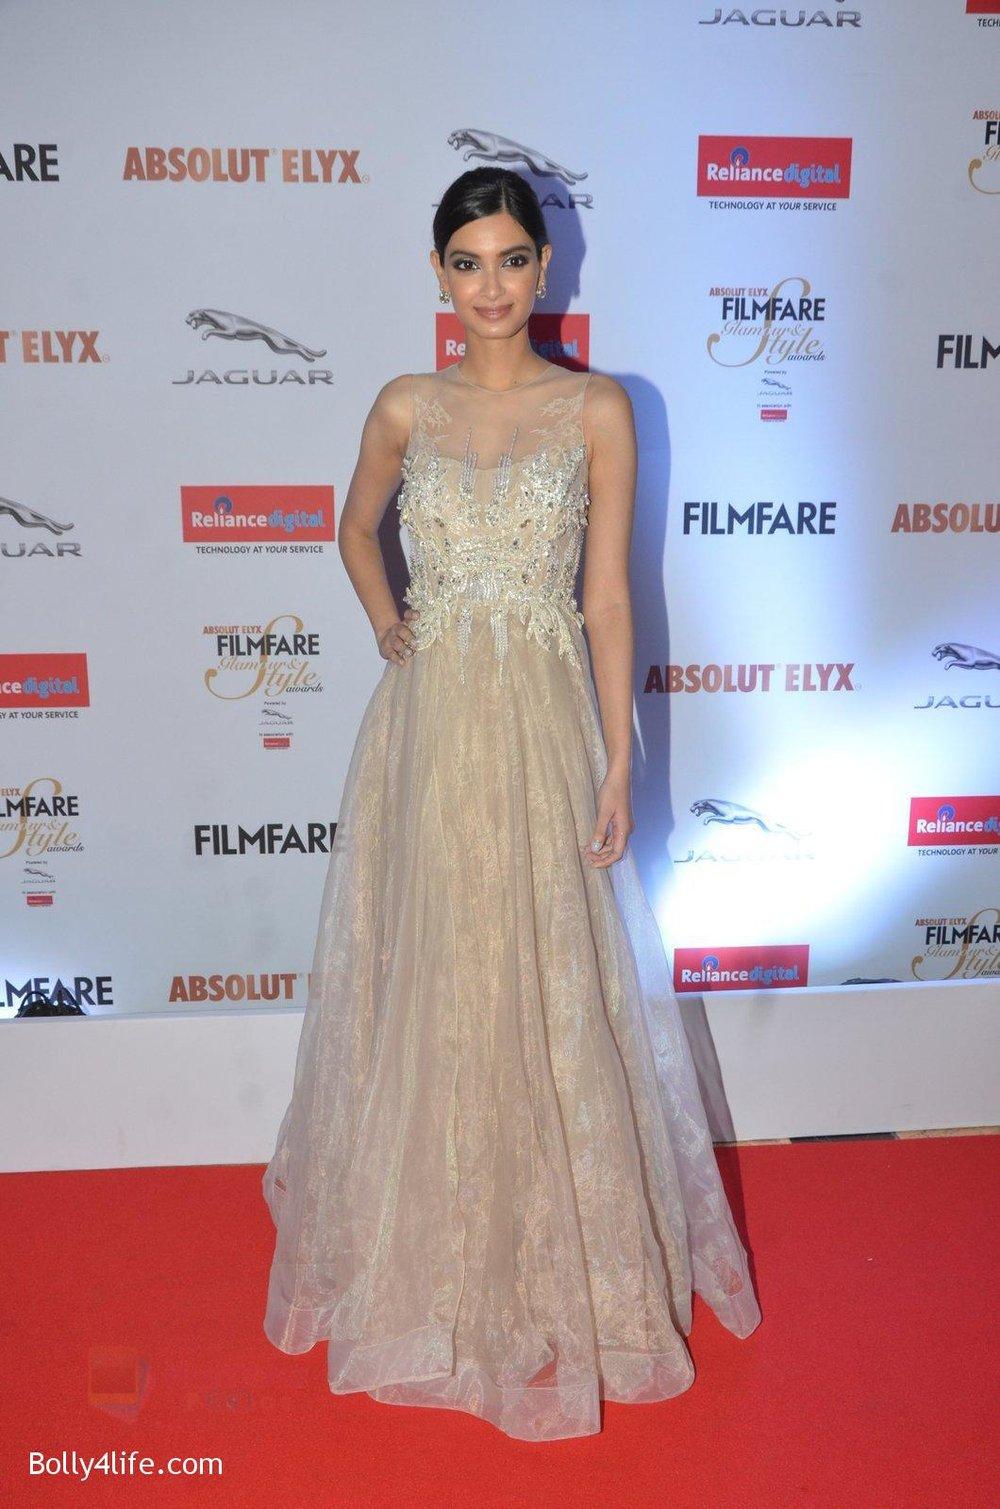 Diana-Penty-at-Filmfare-Glamour-Style-Awards-2016-in-Mumbai-on-15th-Oct-2016-1800.jpg